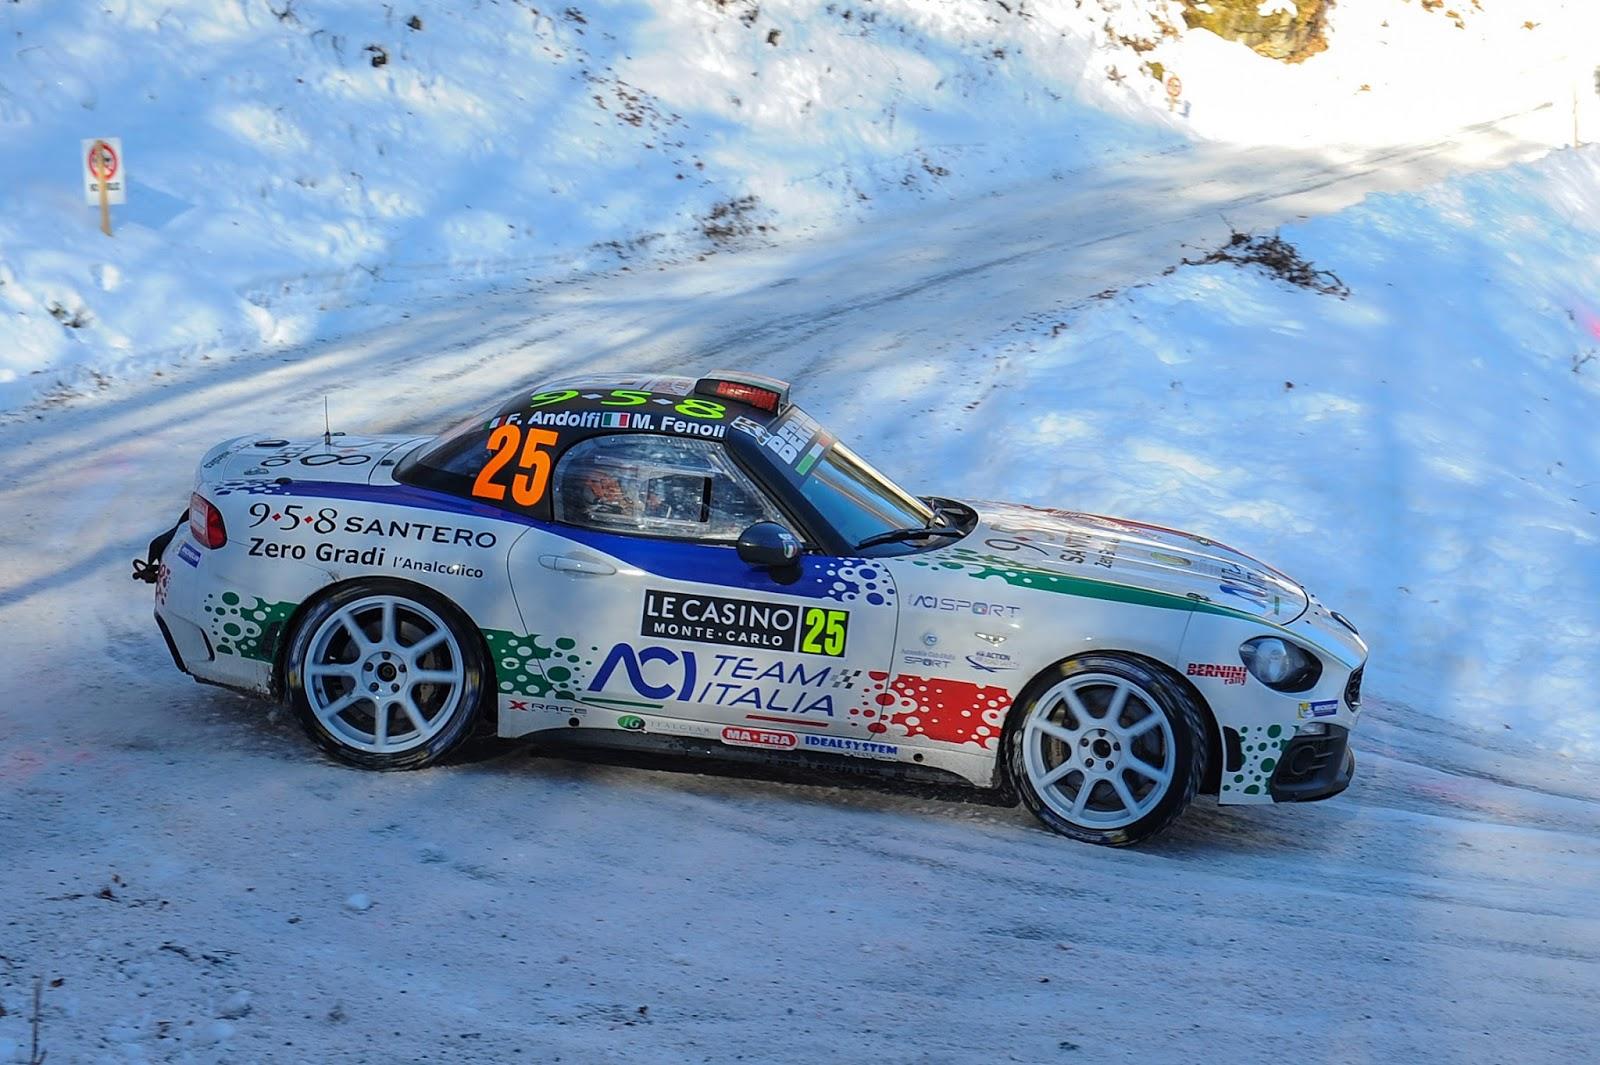 170123 Abarth Andolfi Θετική παρουσία για το Abarth 124 rally στην αγωνιστική του πρεμιέρα στο 85ο Rally του Monte Carlo Abarth, Abarth 124, Abarth 124 Rally, Fiat, Rally, Rallye Automobile Monte Carlo